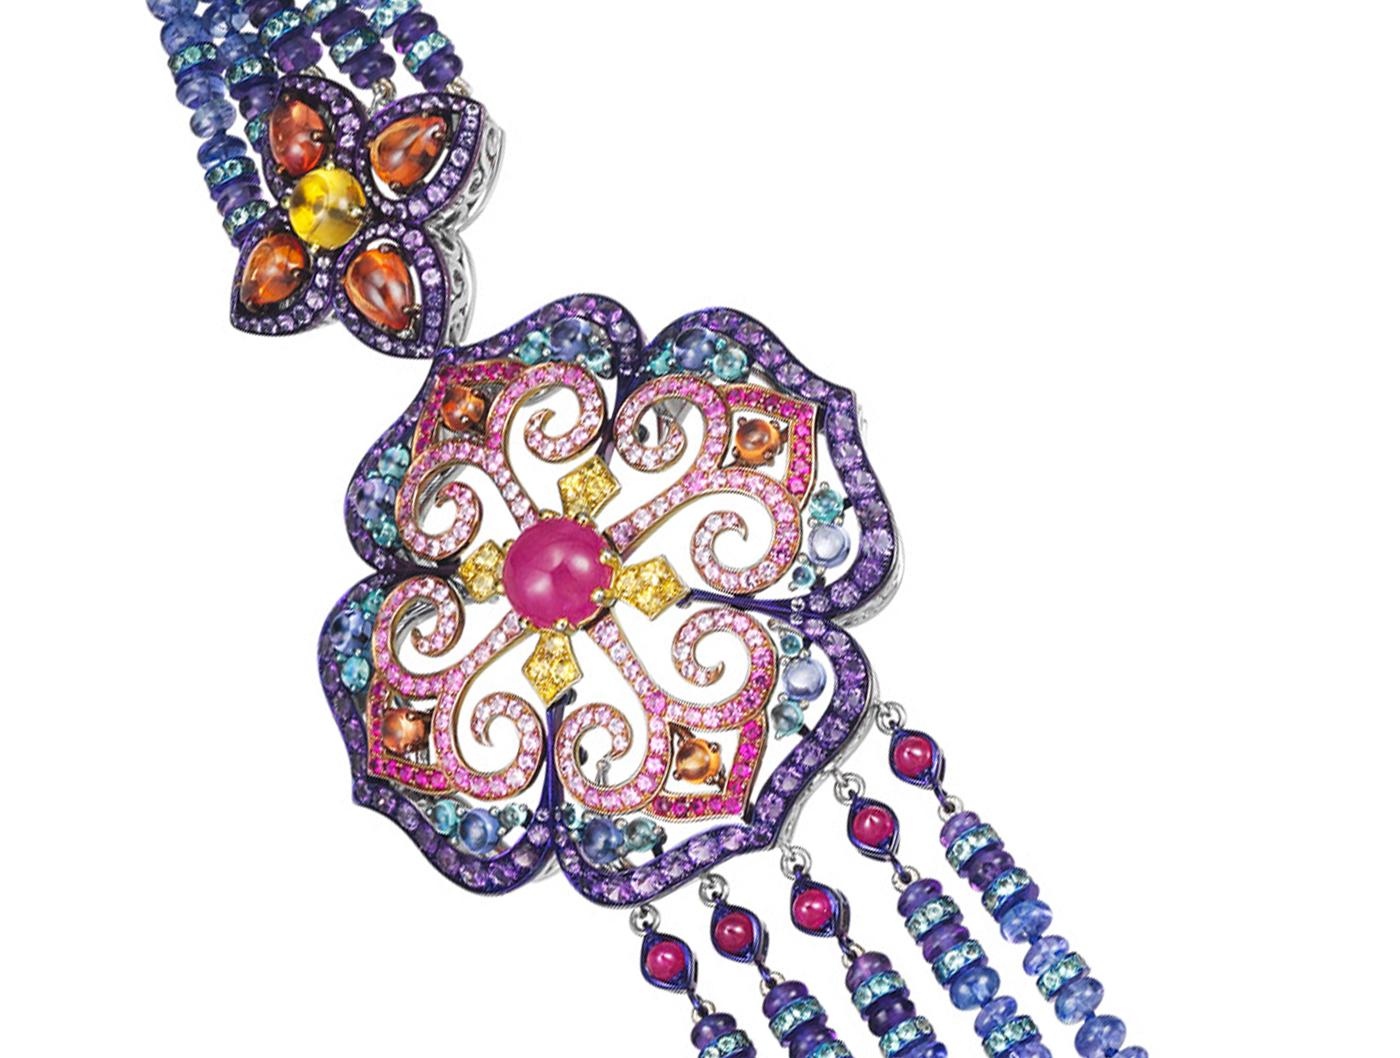 Alta gioielleria - gancio floreale collana chopard